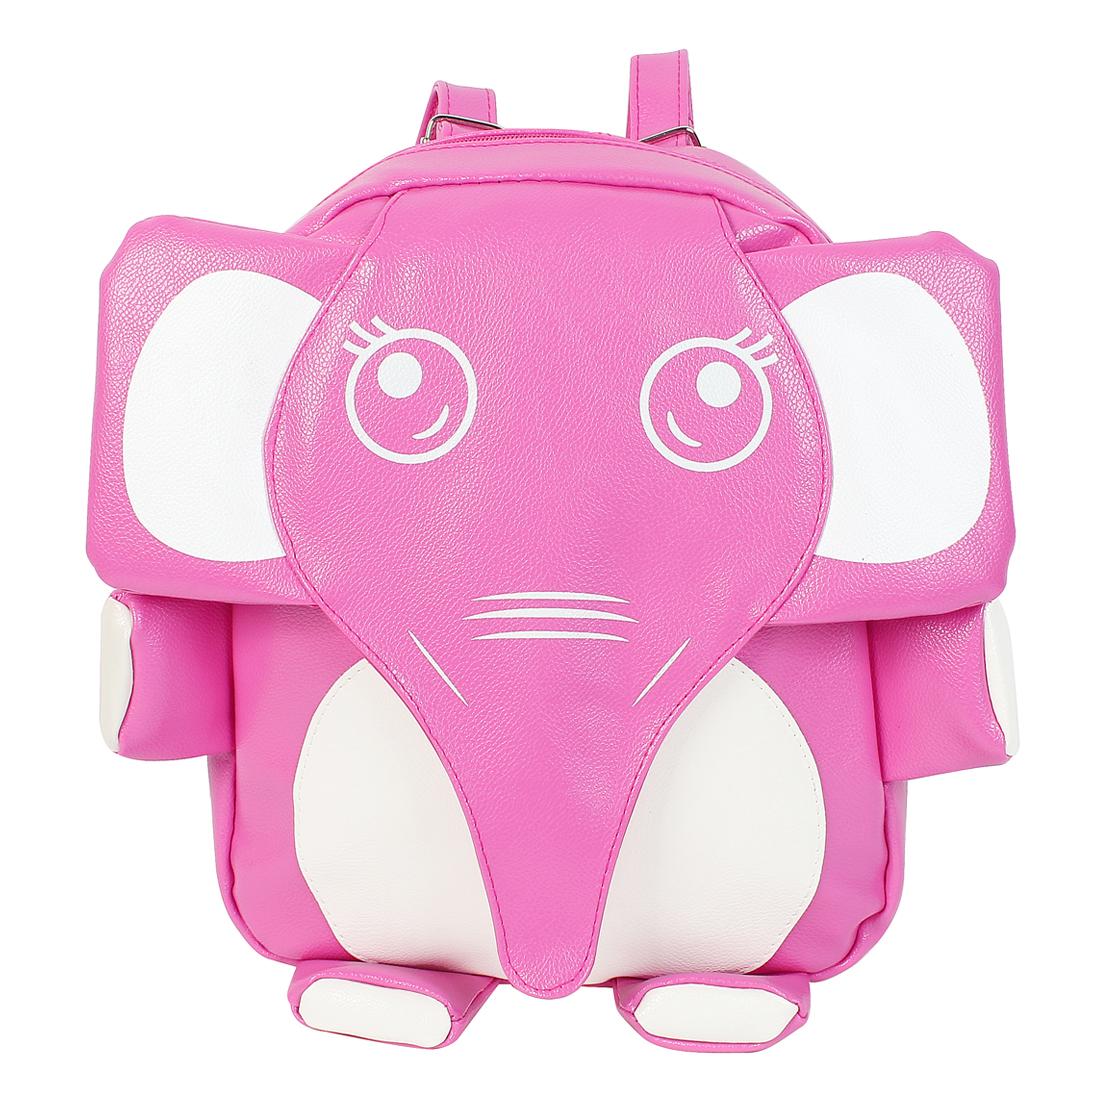 2015 New PU Leather Elephant Pattern Cute Mini Backpack School Bookbag Pink